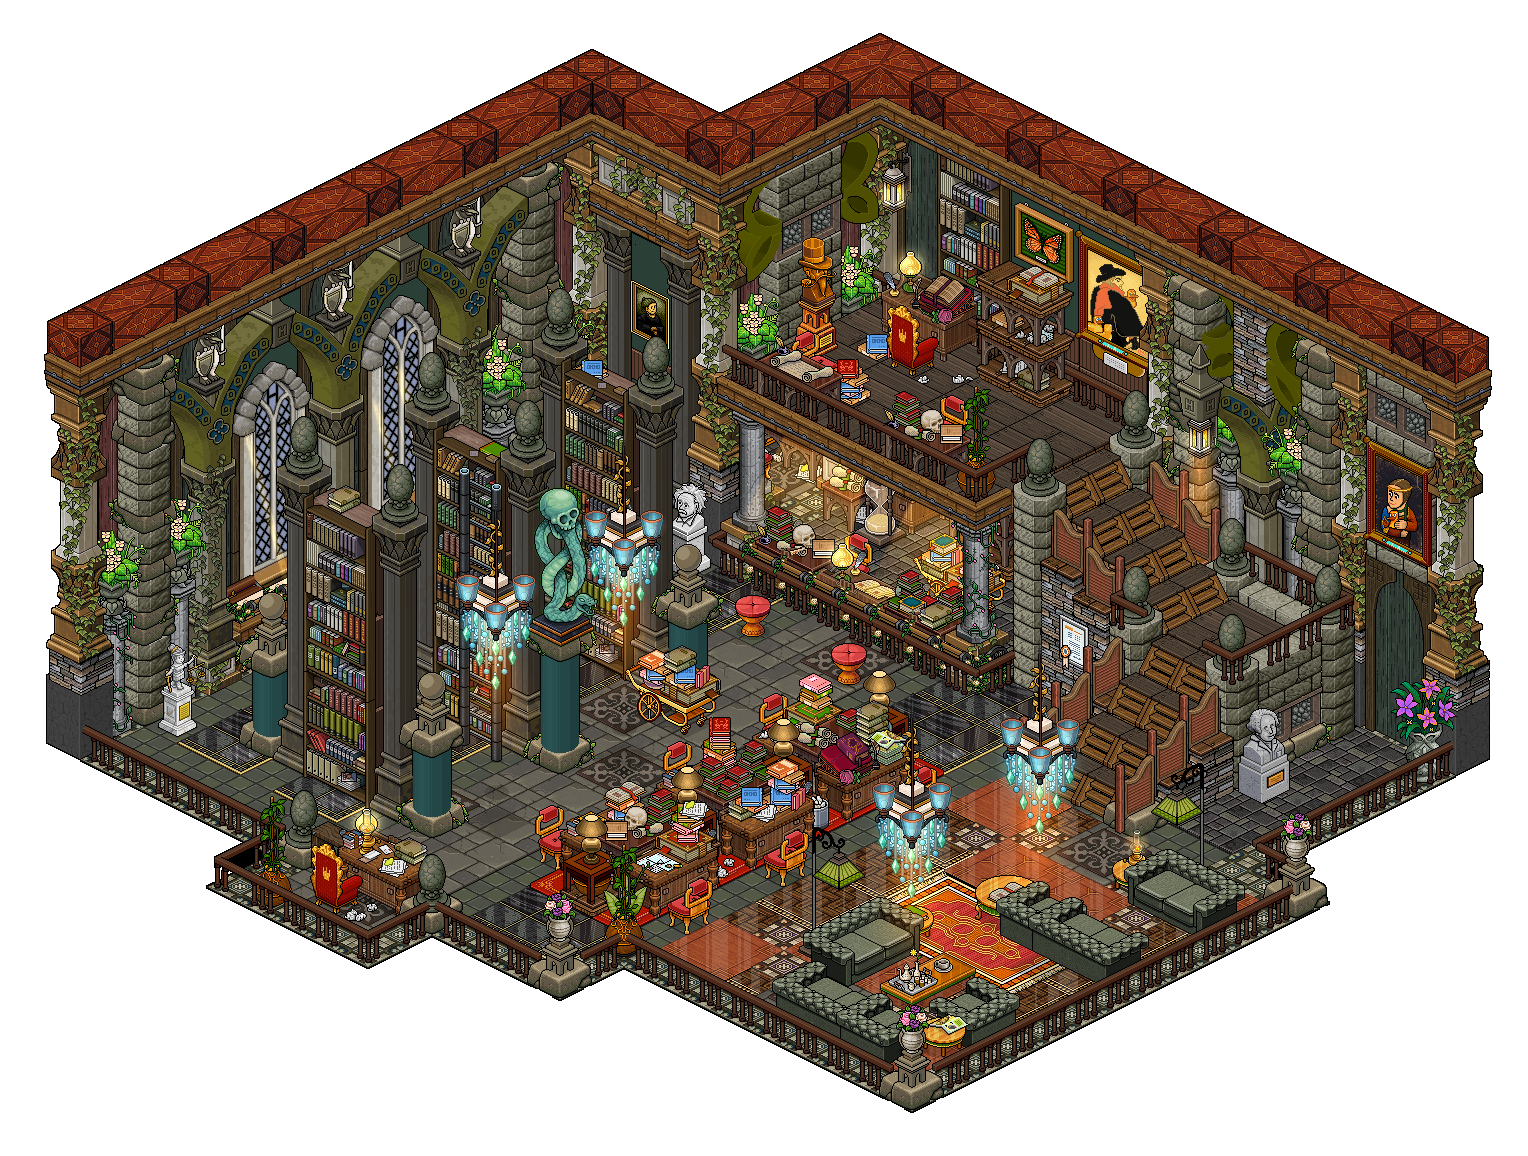 Mansion - Library by Cutiezor on DeviantArt